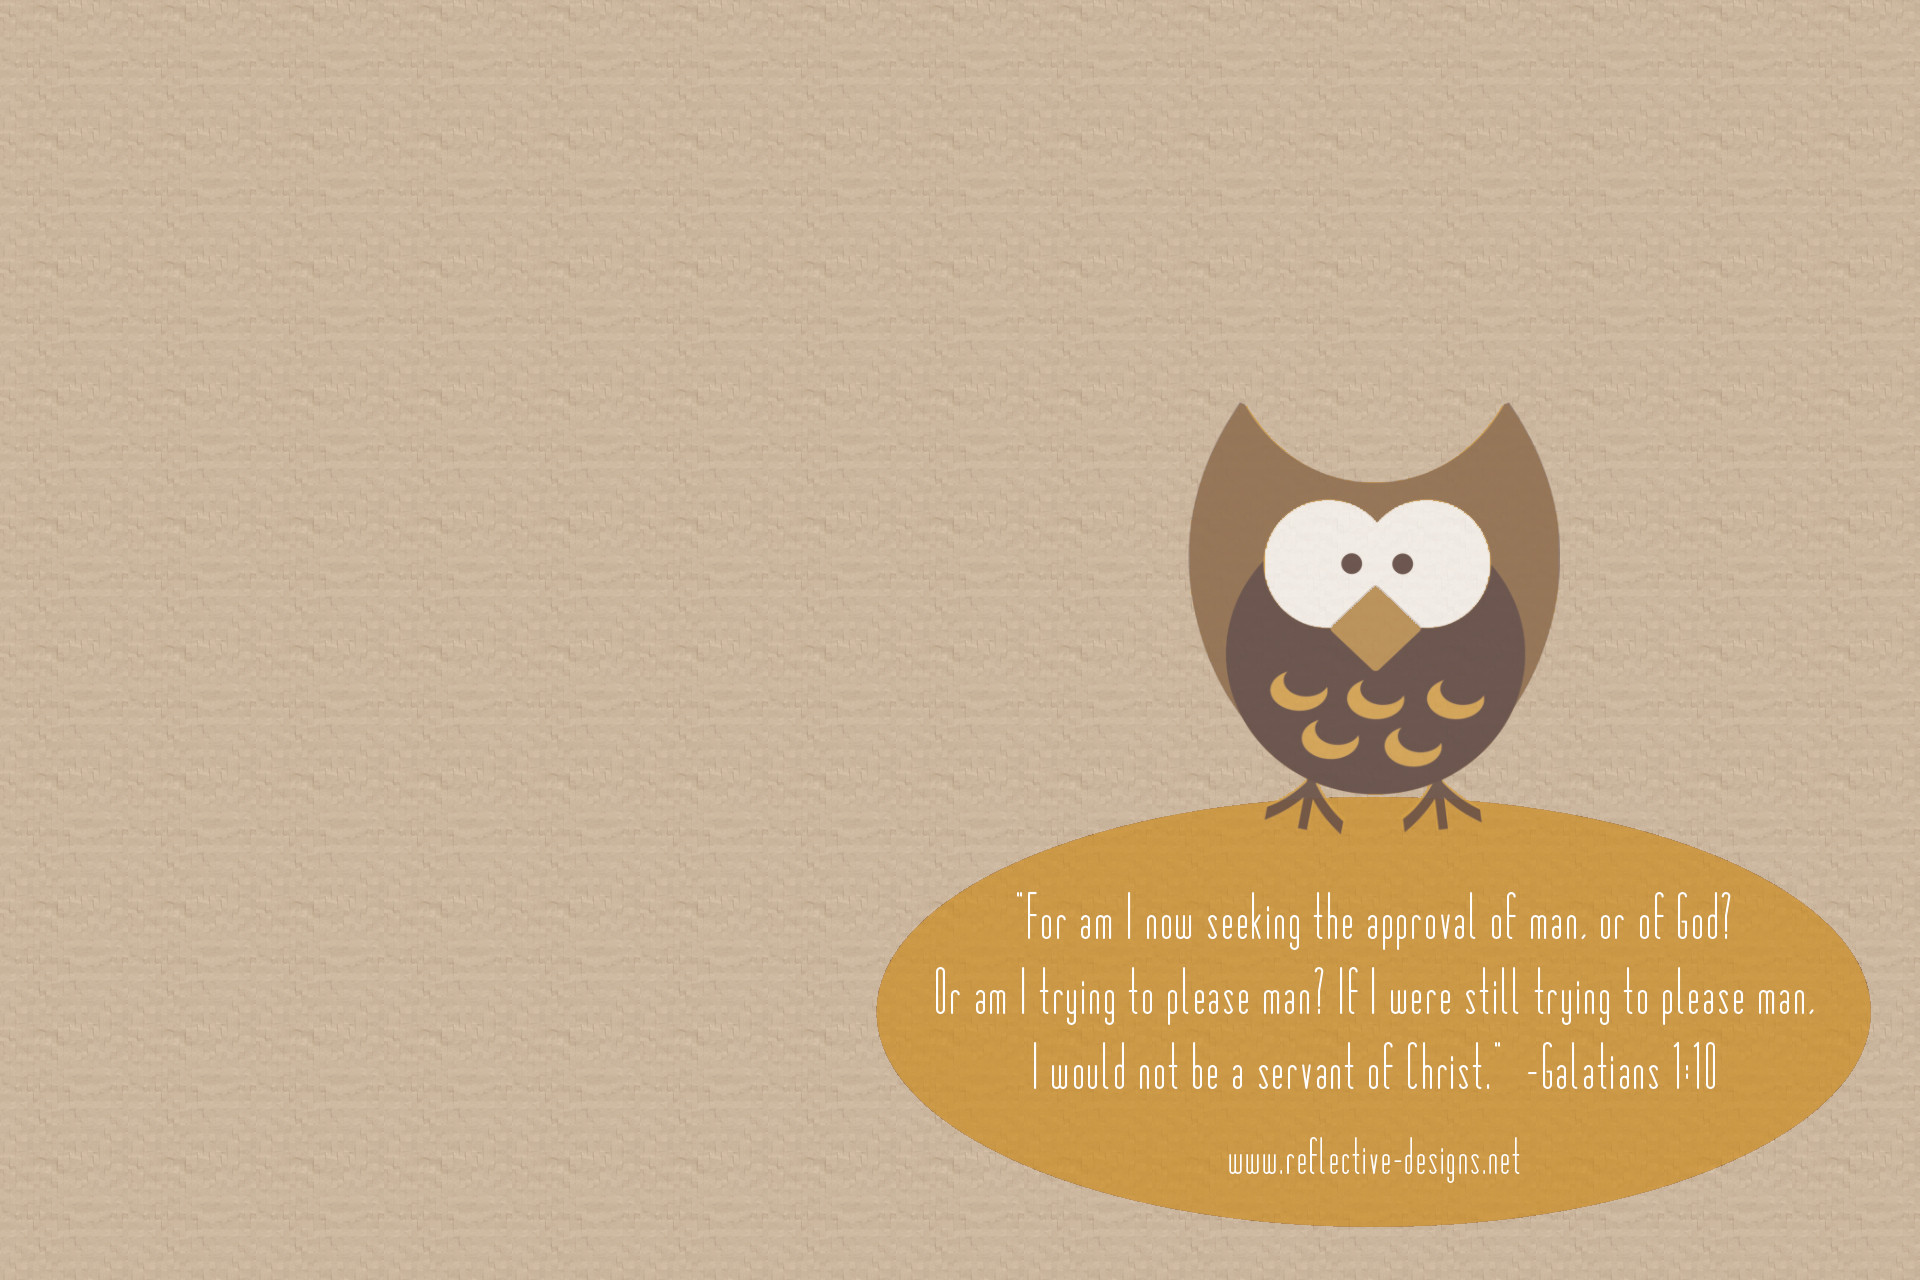 Scripture Quotes Desktop Wallpaper Cute Owl Wallpapers 65 Images